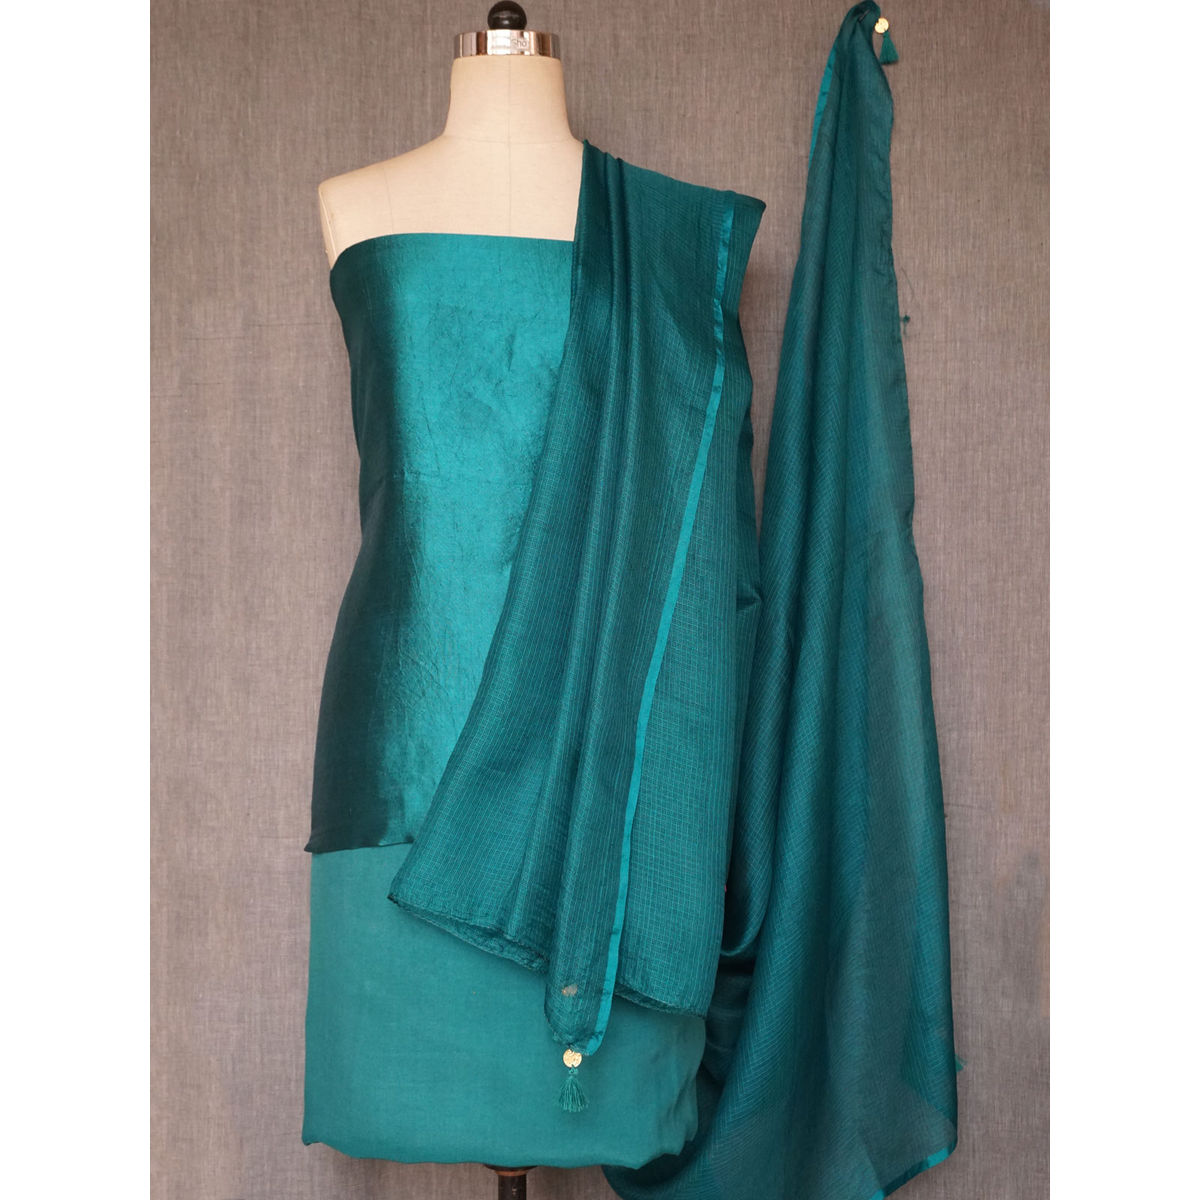 Teal silk dress material with hand badla & mukesh work with kota silk dupatta